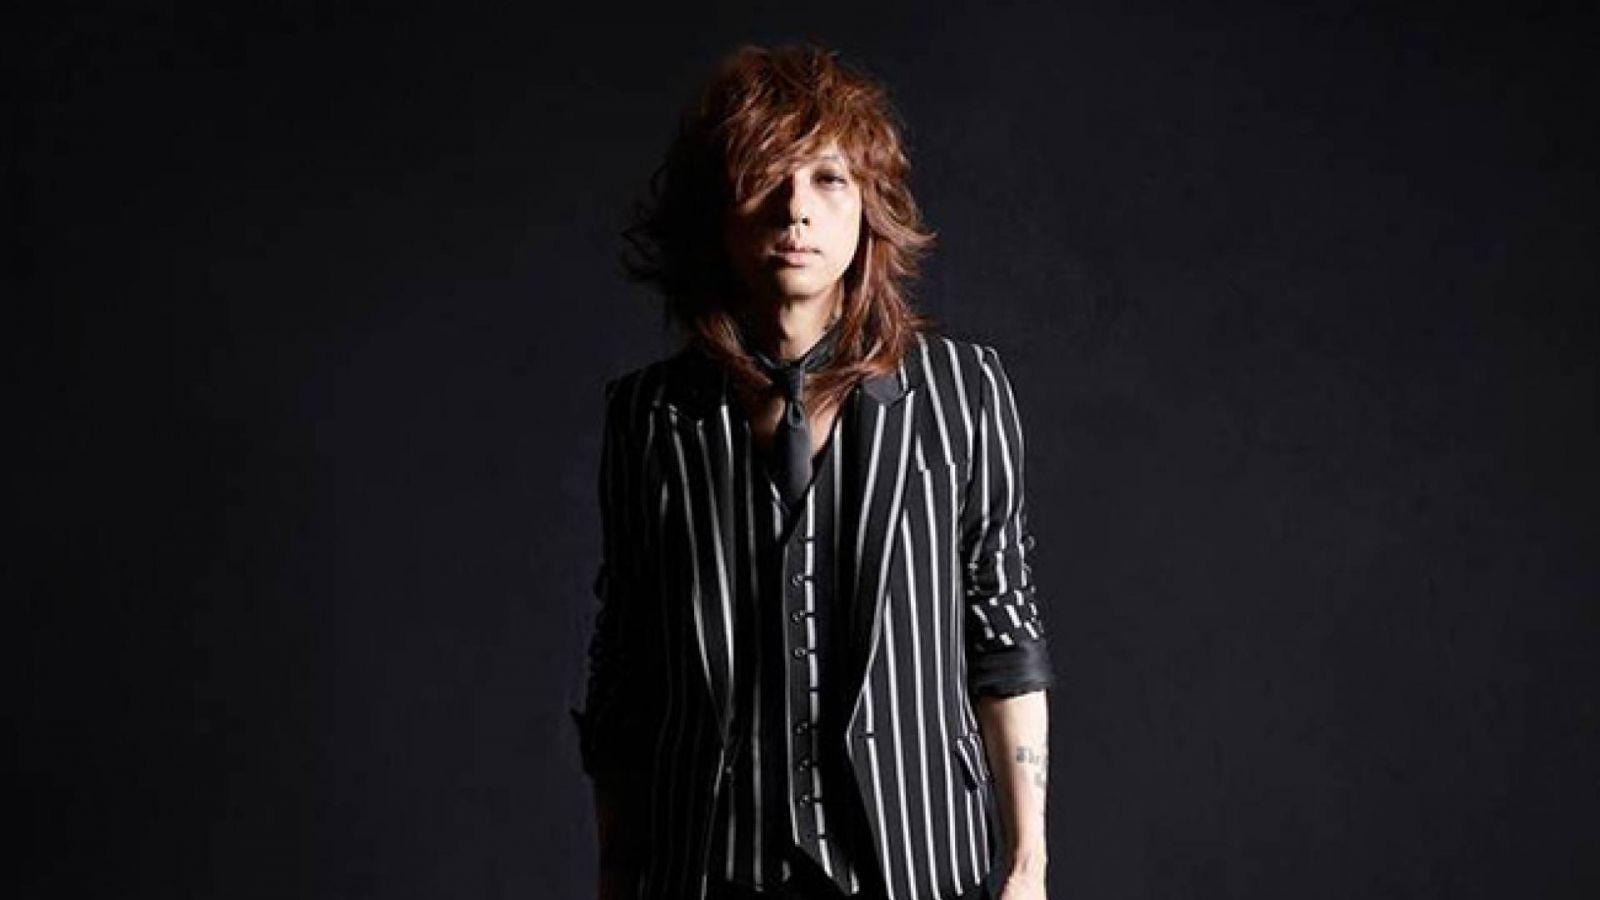 Новый альбом Kiyoharu © Warner Music Japan. All Rights Reserved.